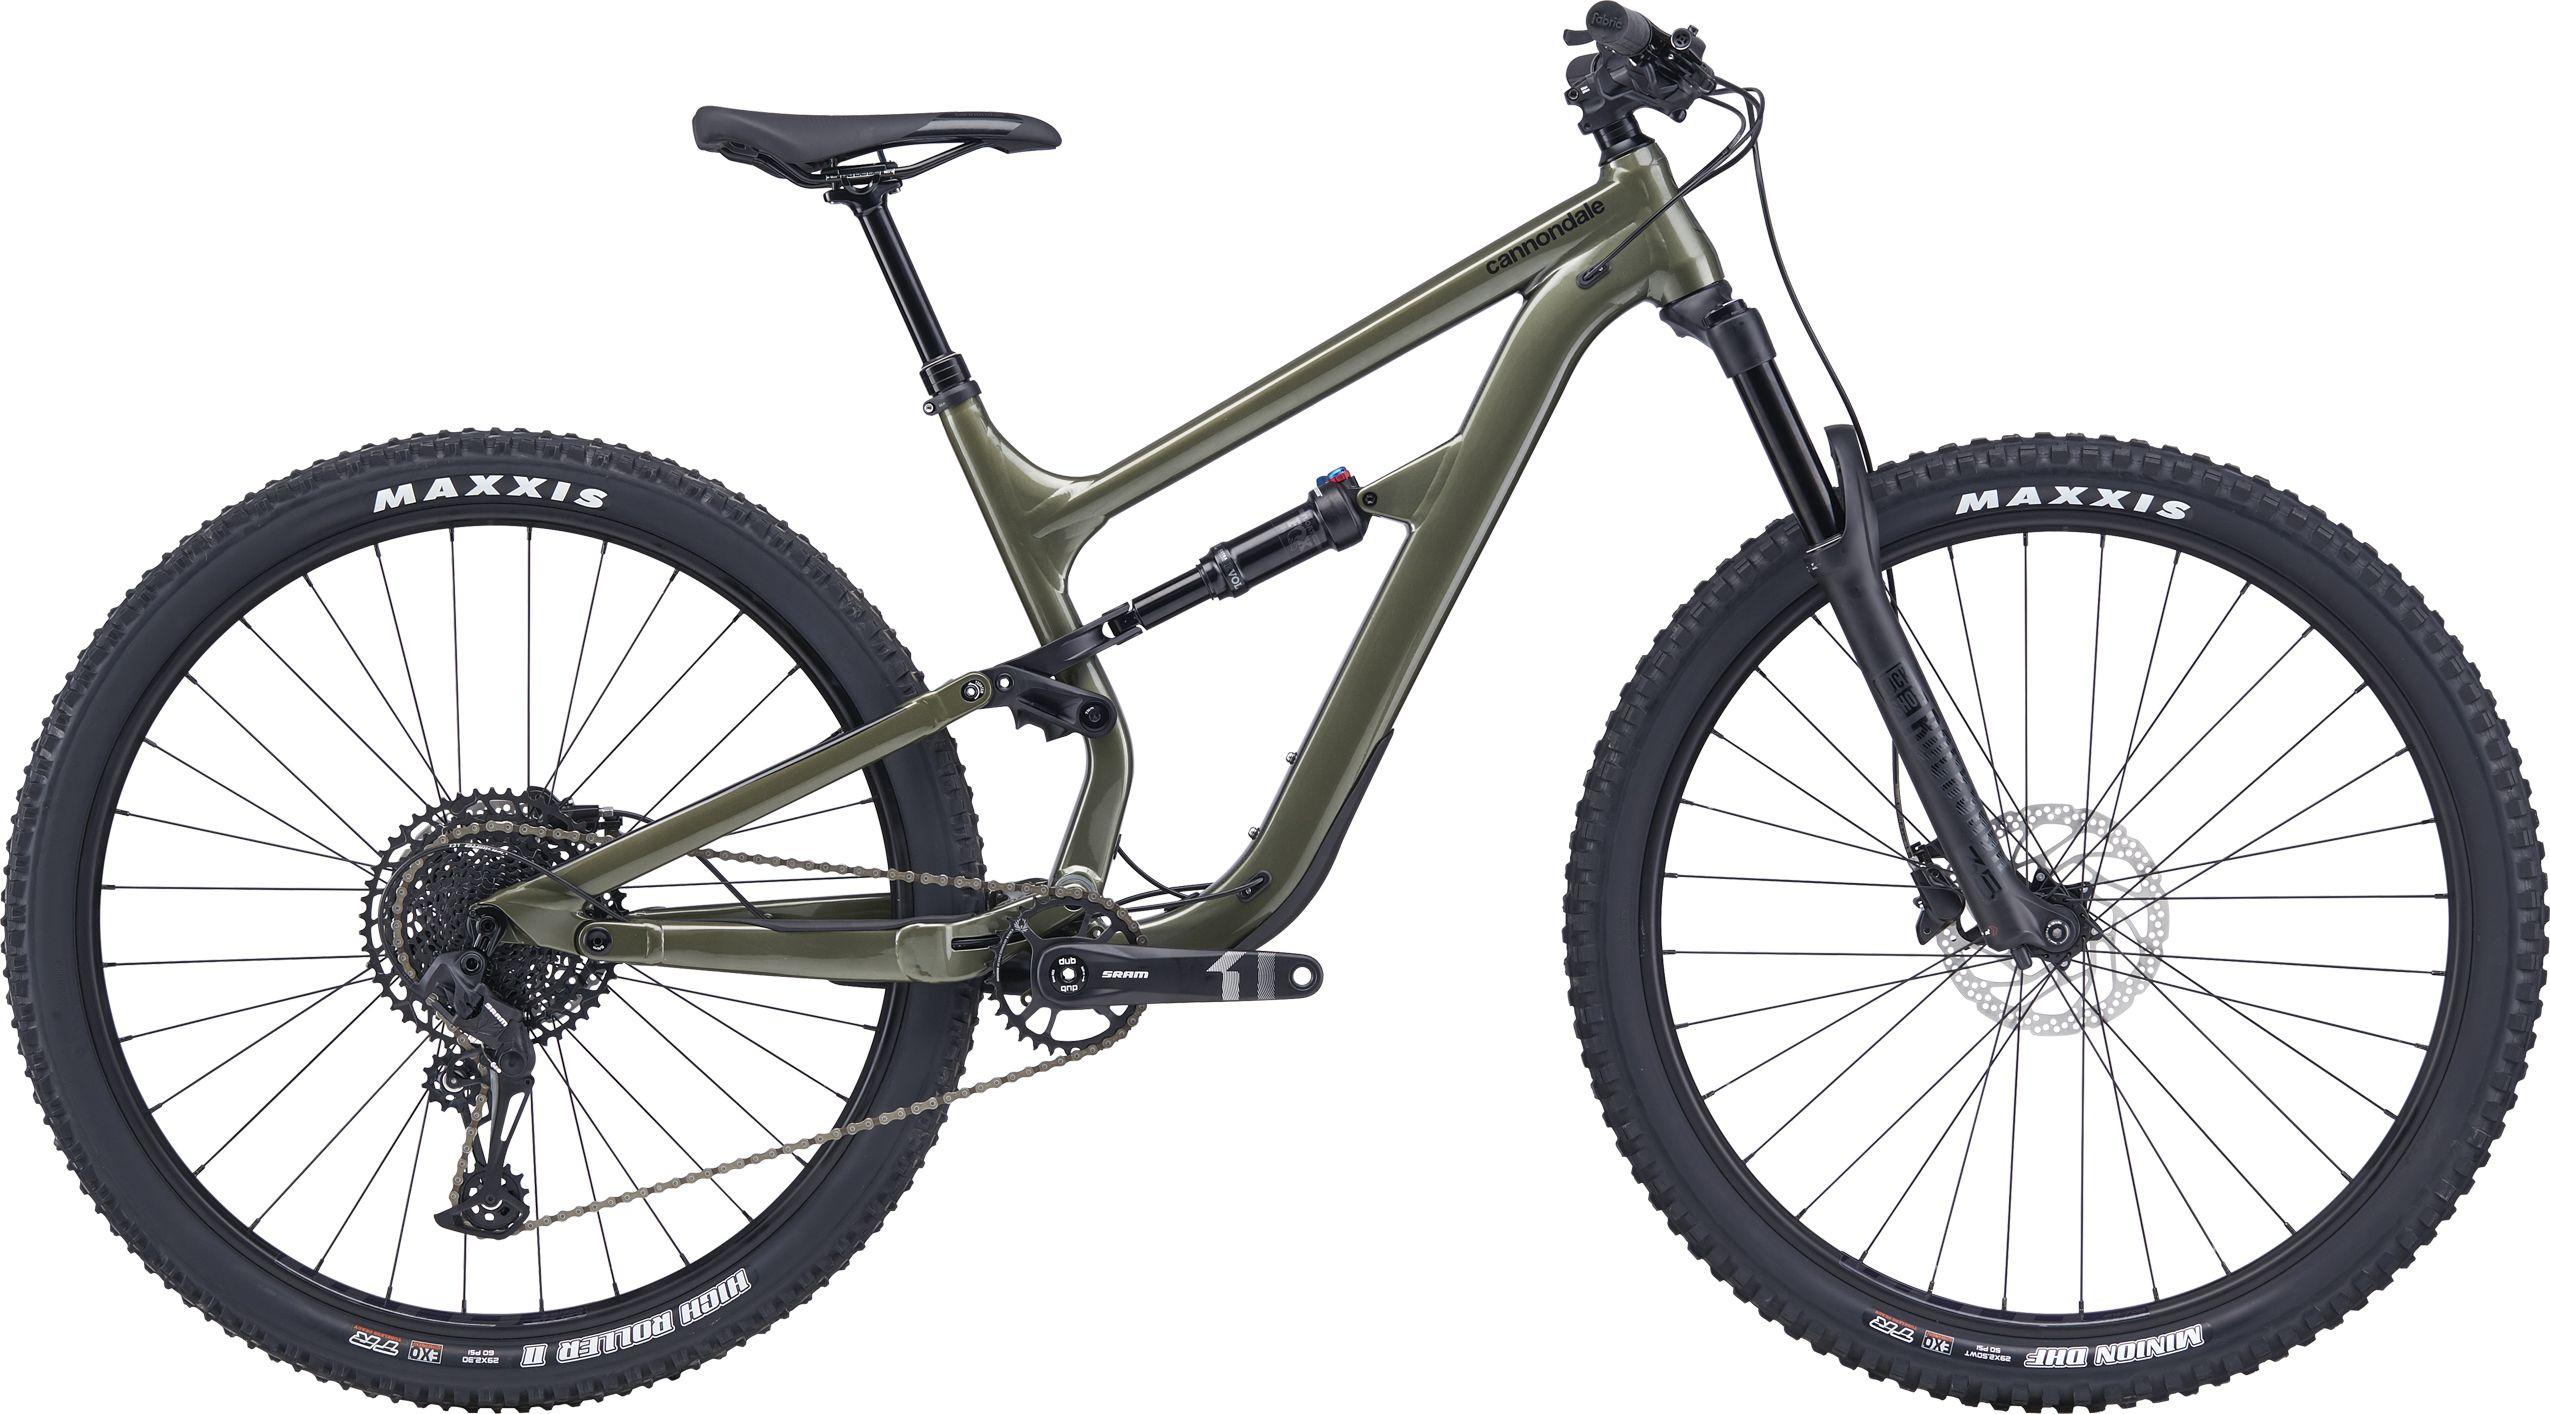 Cannondale Habit 5 29er Mountain Bike 2020 | Mountainbikes